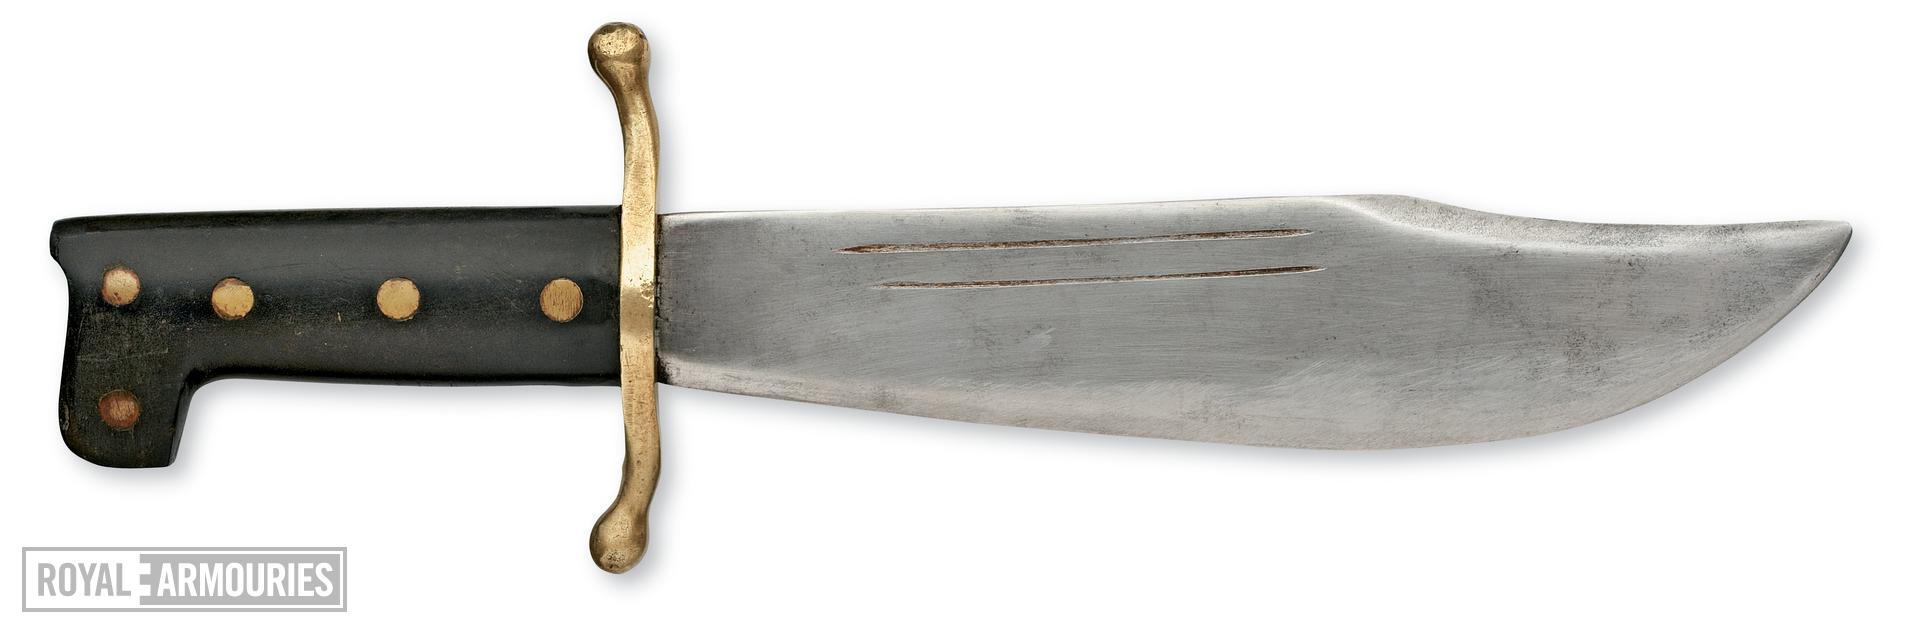 Knife and sheath V44 Survival knife and sheath